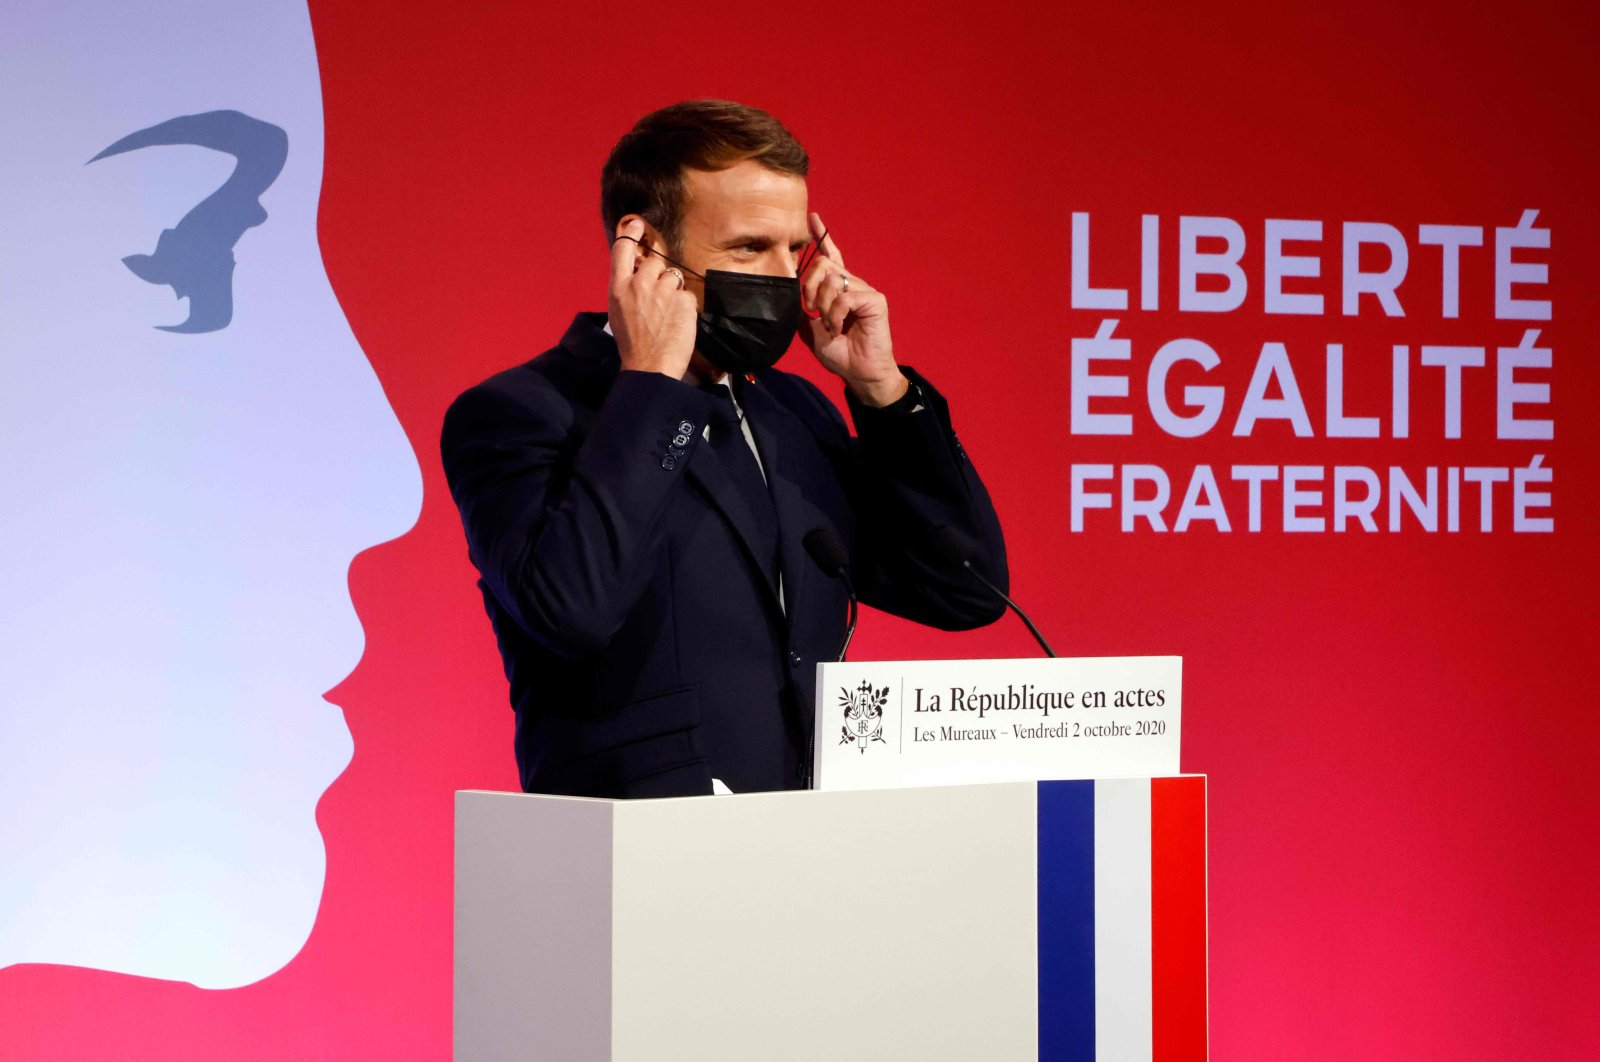 French President Emmanuel Macron wears a mask after delivering a speech in Les Mureaux, Paris, France, Oct. 2, 2020. (AFP Photo)